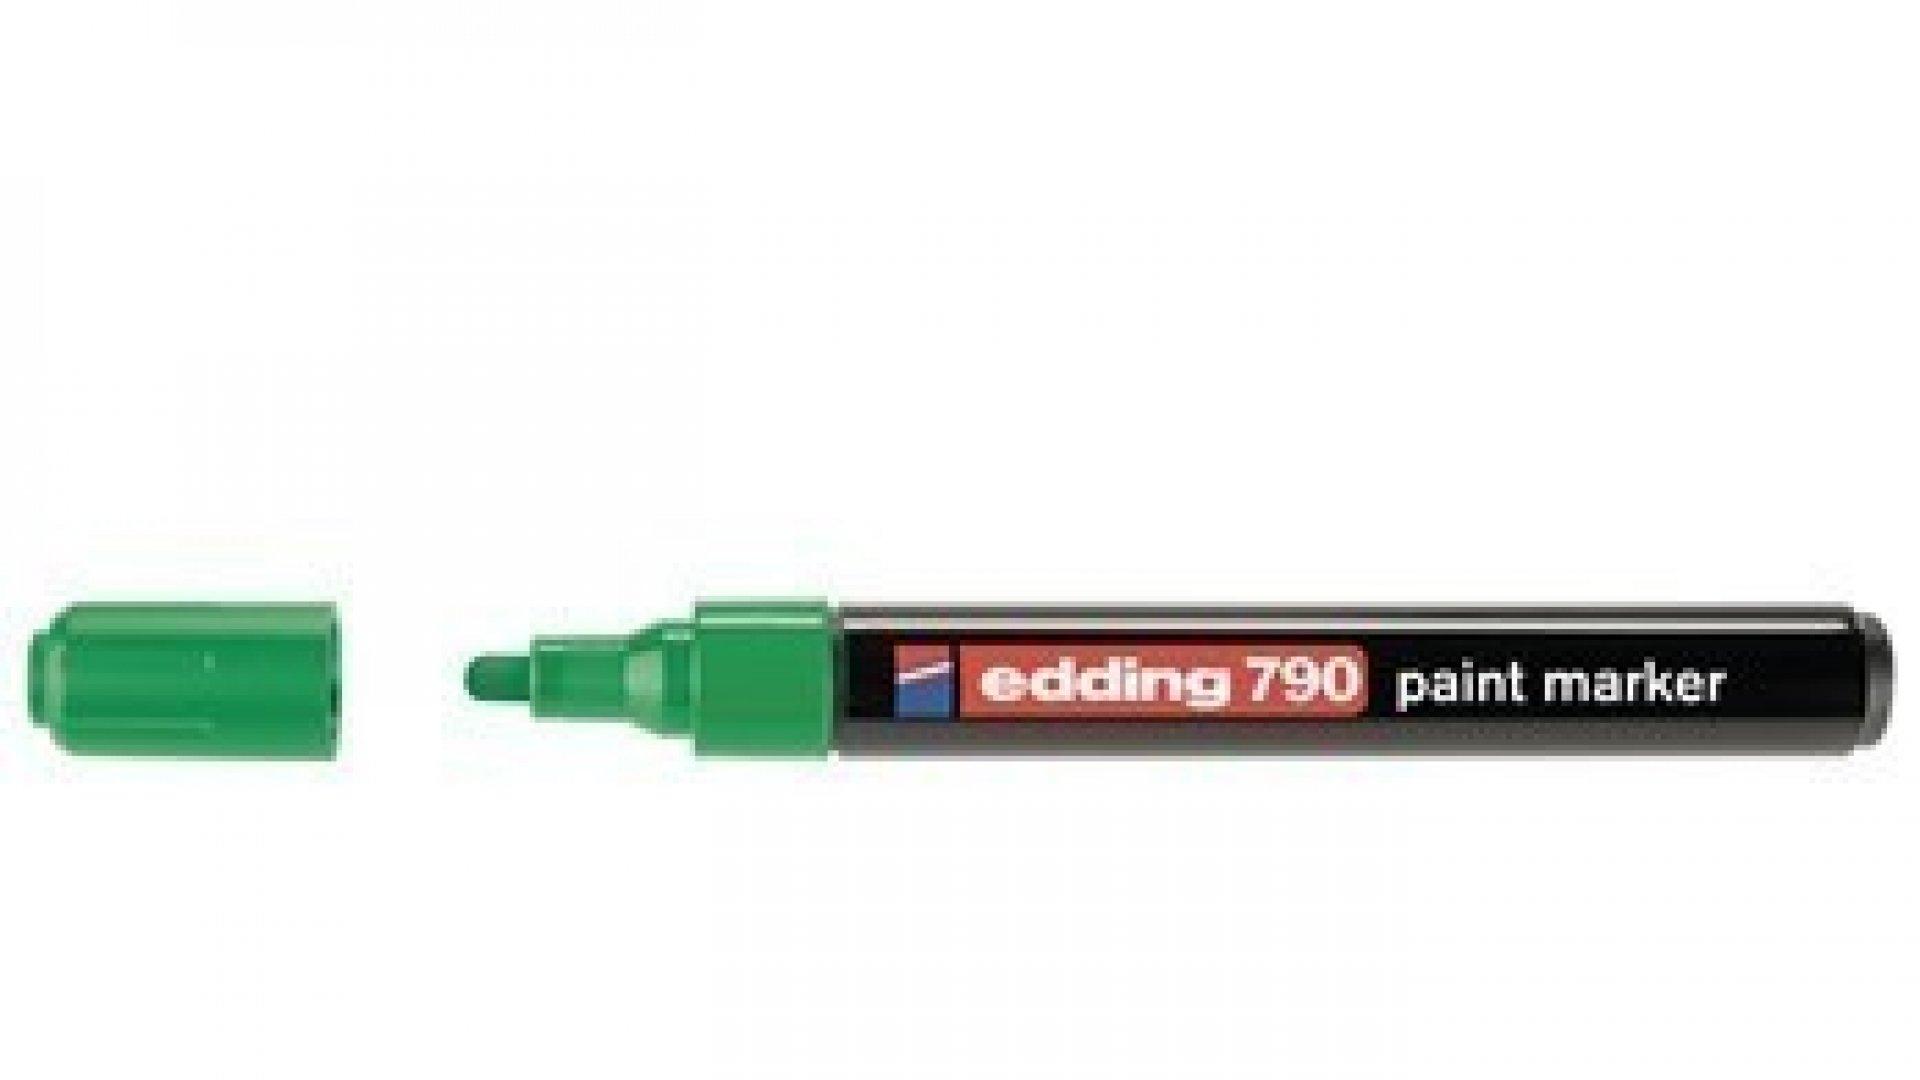 PAINT MARKER EDDING 790